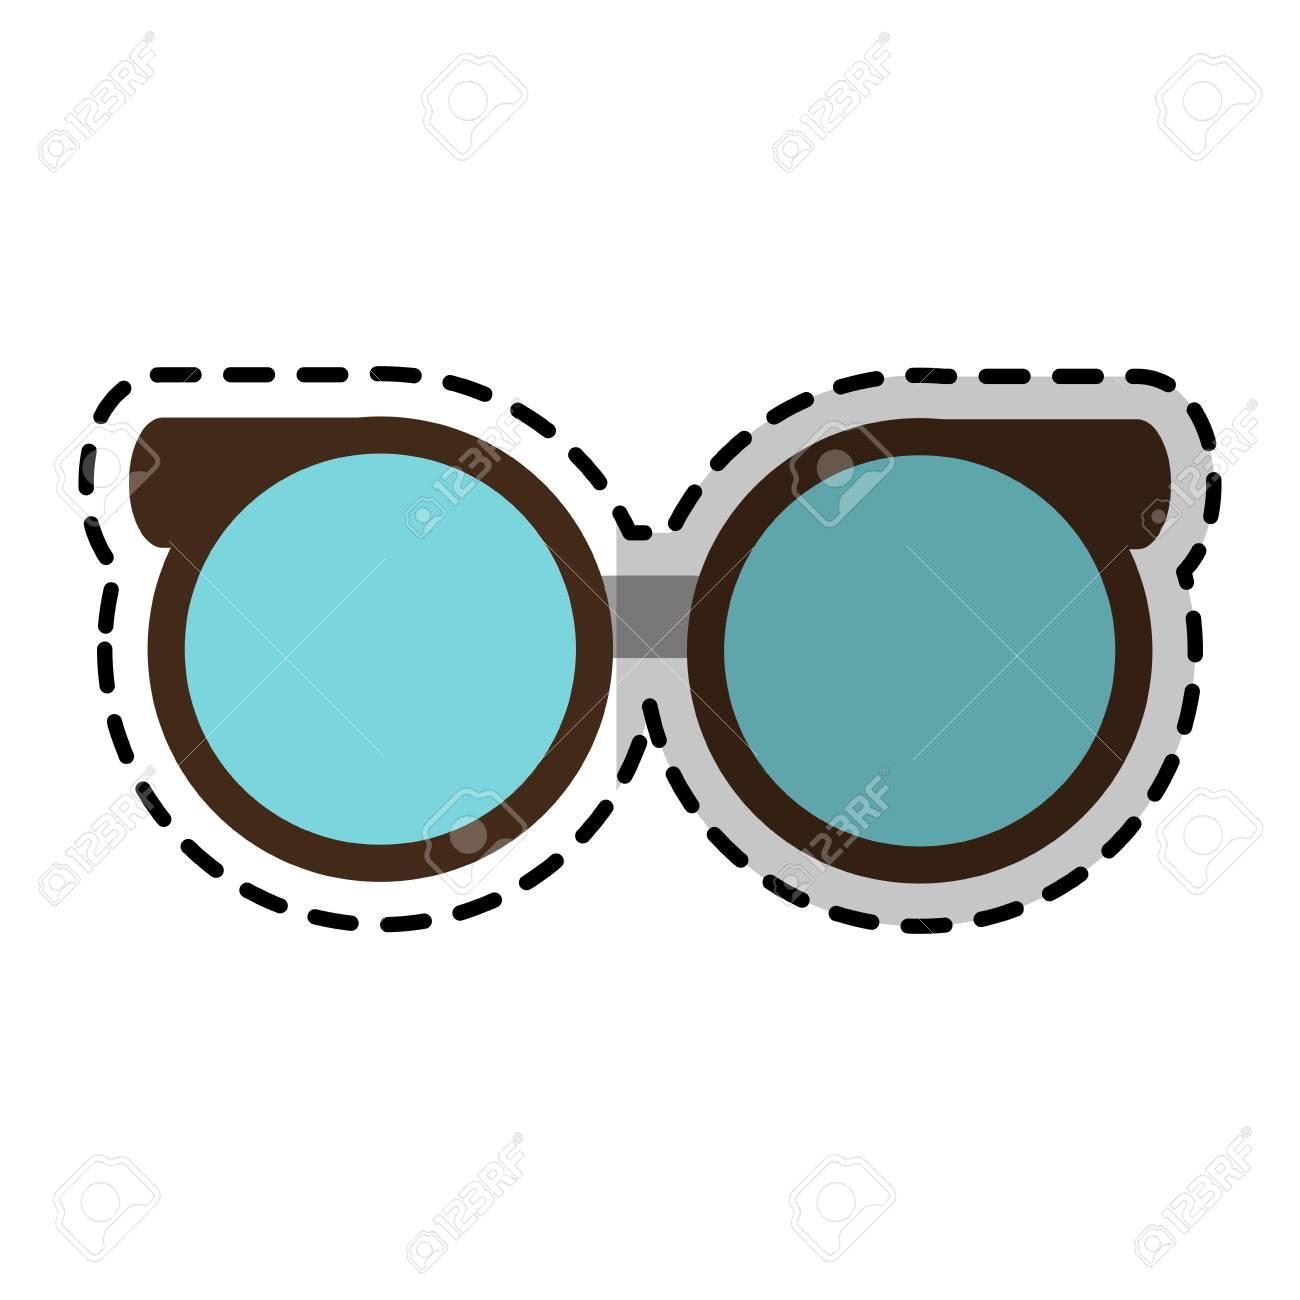 Round Glasses Frame Icon Image Vector Illustration Design Royalty ...